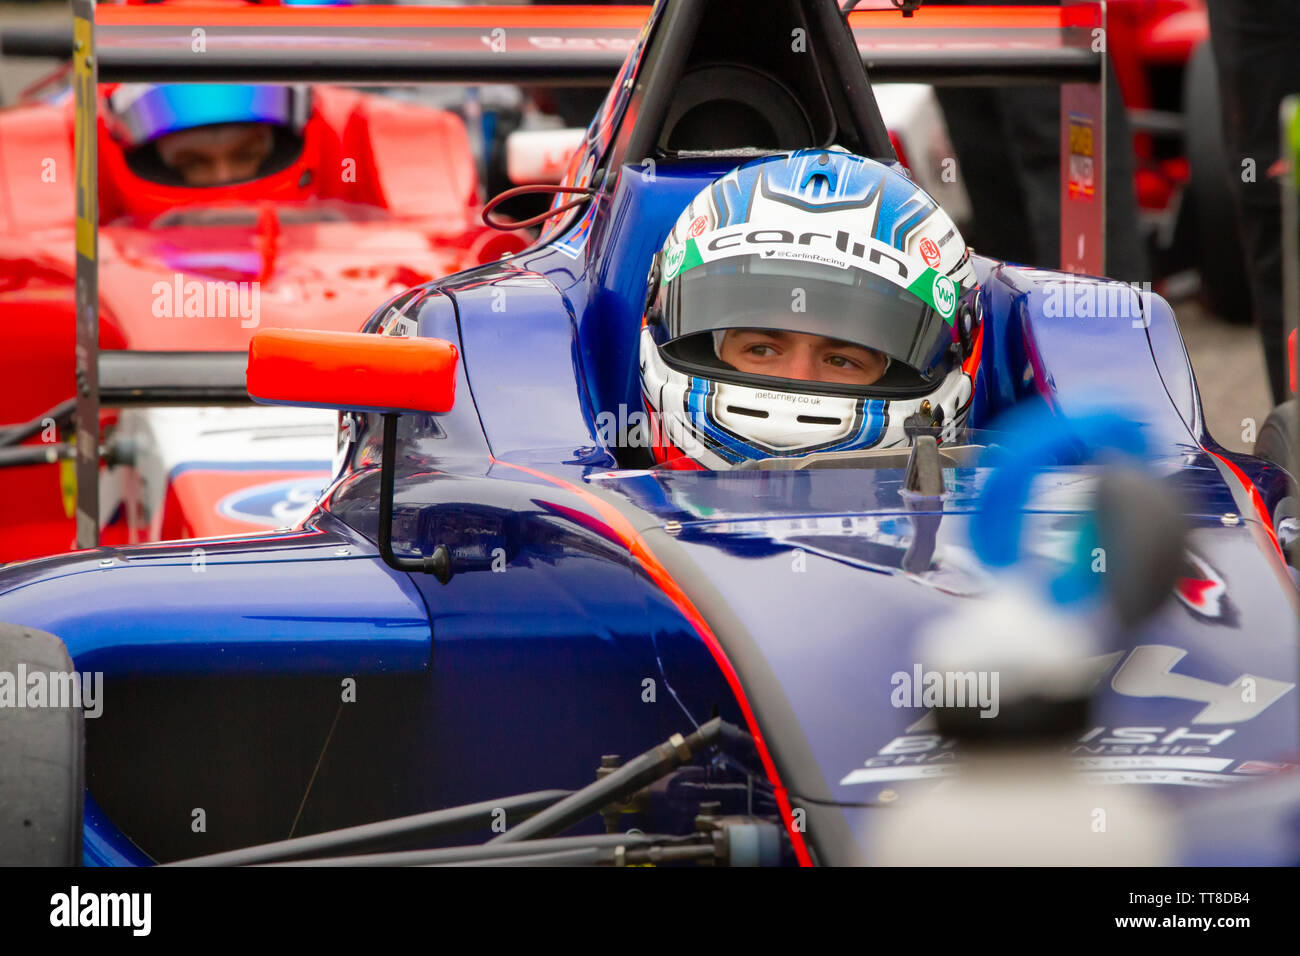 Joe Turney, British racing driver waits in his car. British Formula 4 paddock, prior to qualifying at Brands Hatch - Stock Image